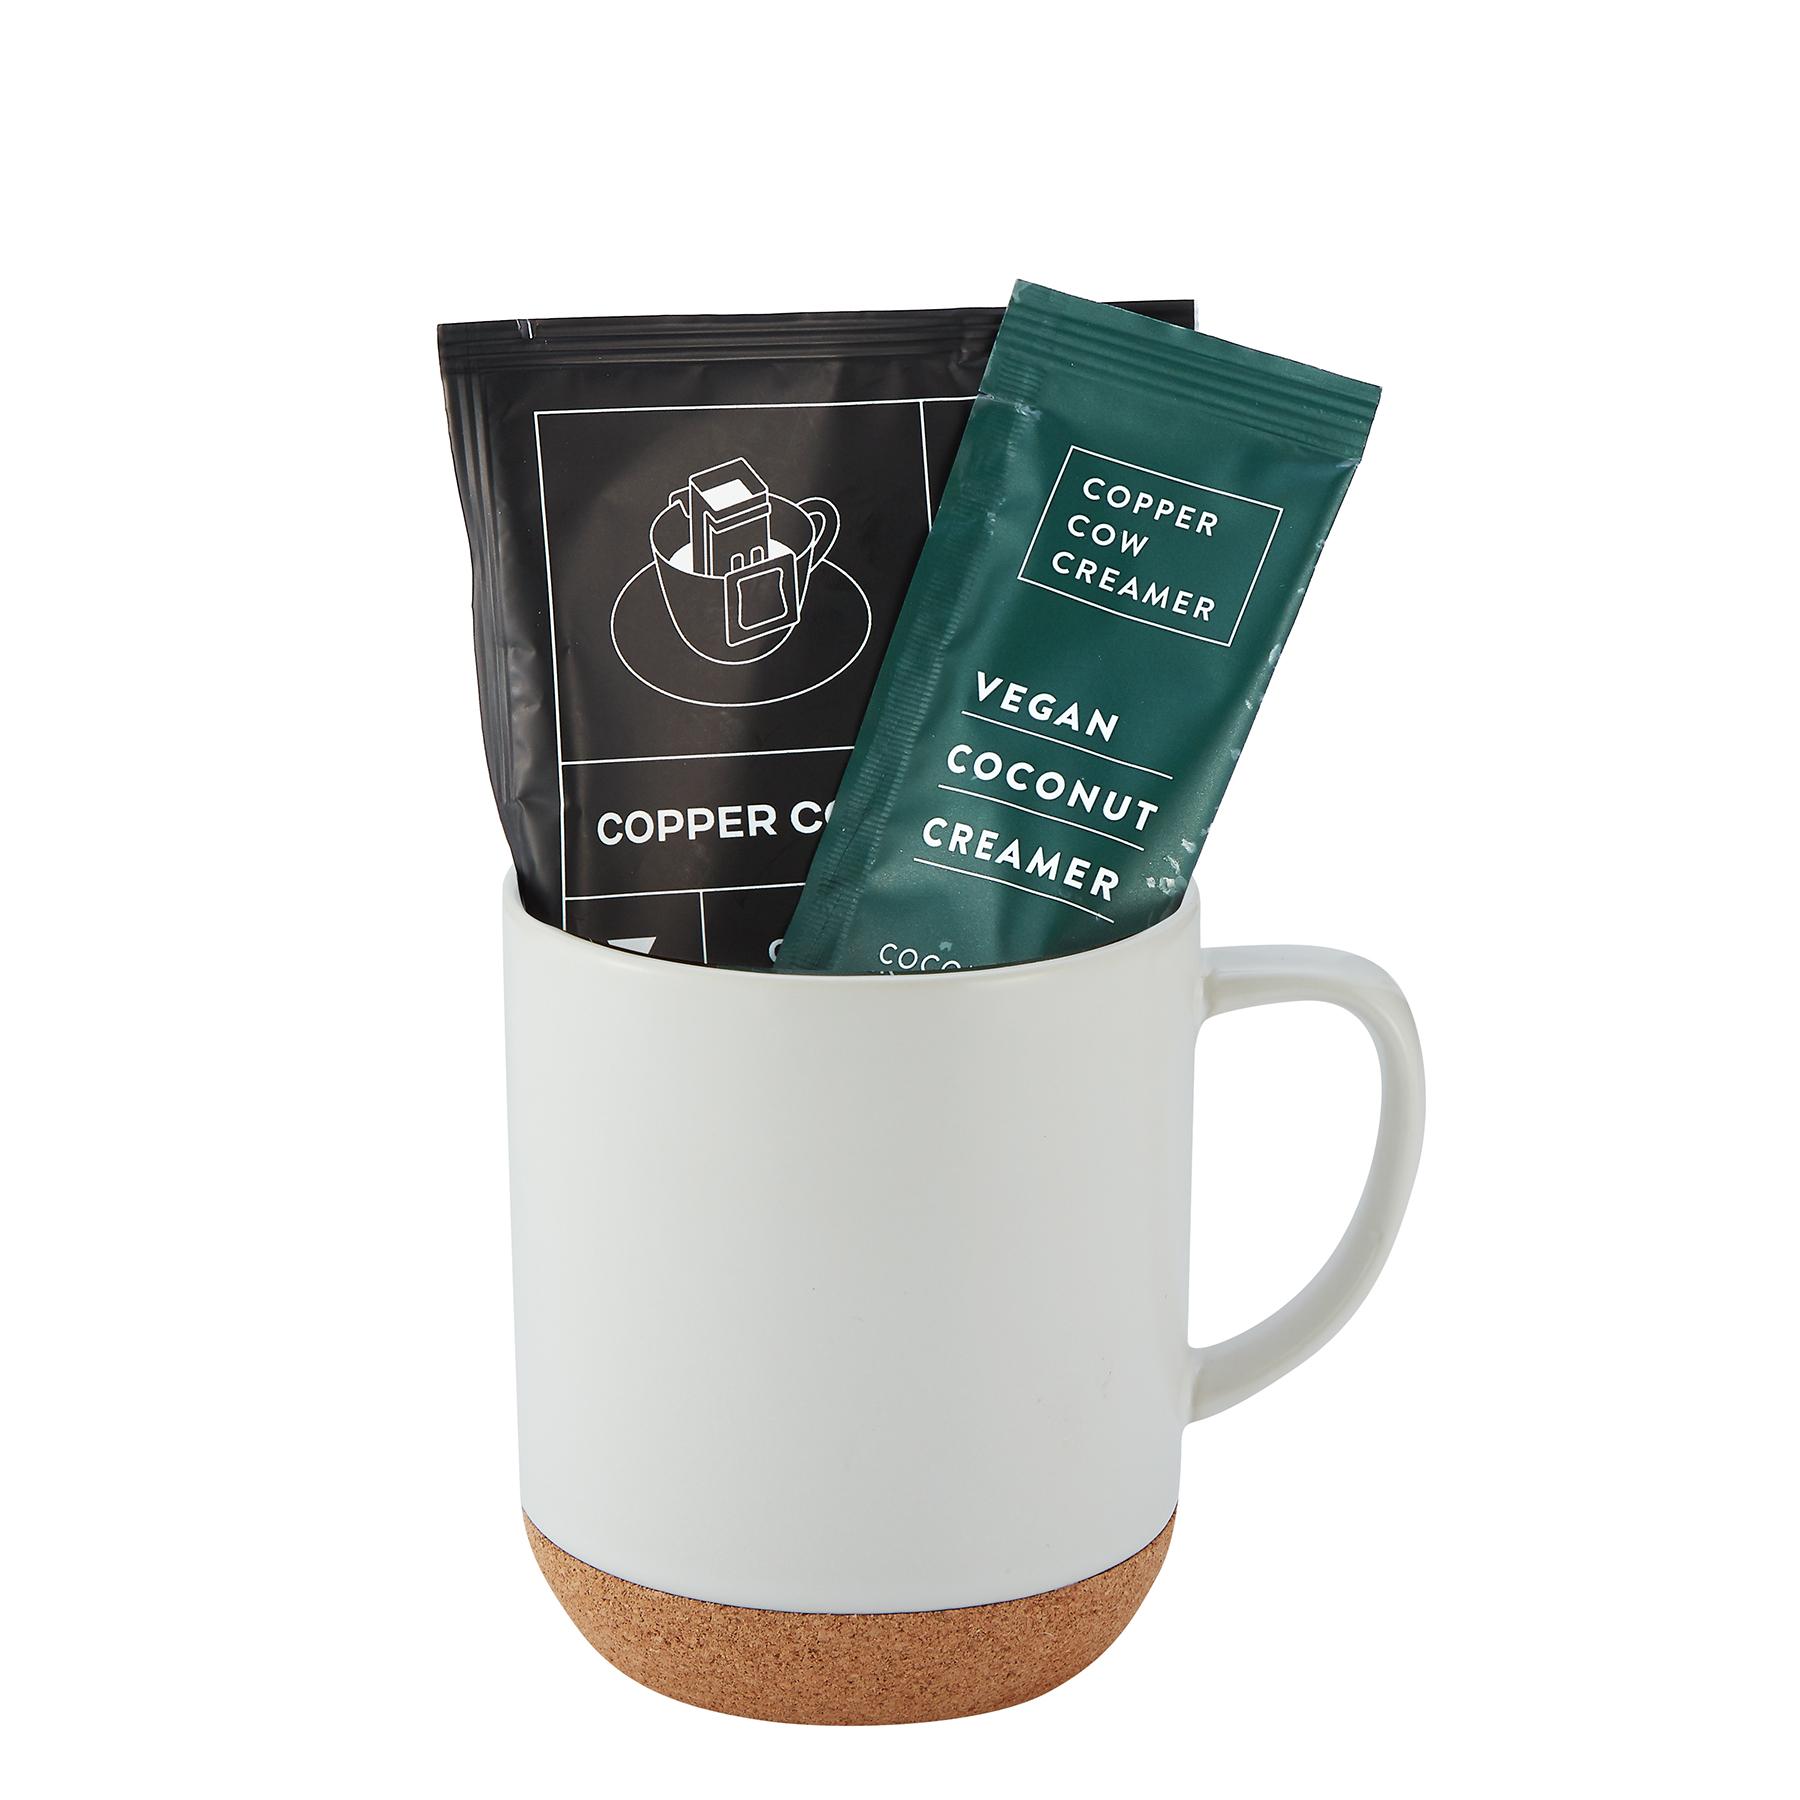 Corky Coffee Gift Set C2